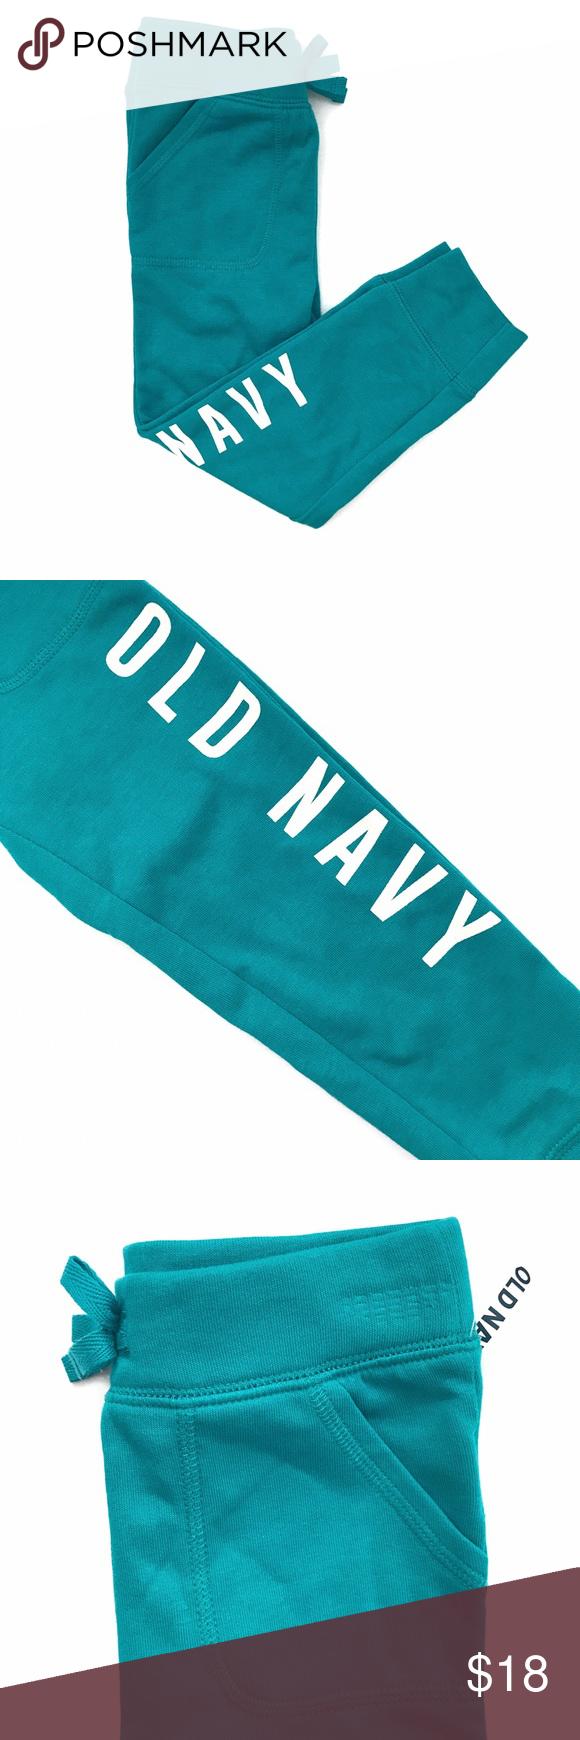 SOLD🚫 Teal Sweatpants Sweatpants, Teal, Navy logo